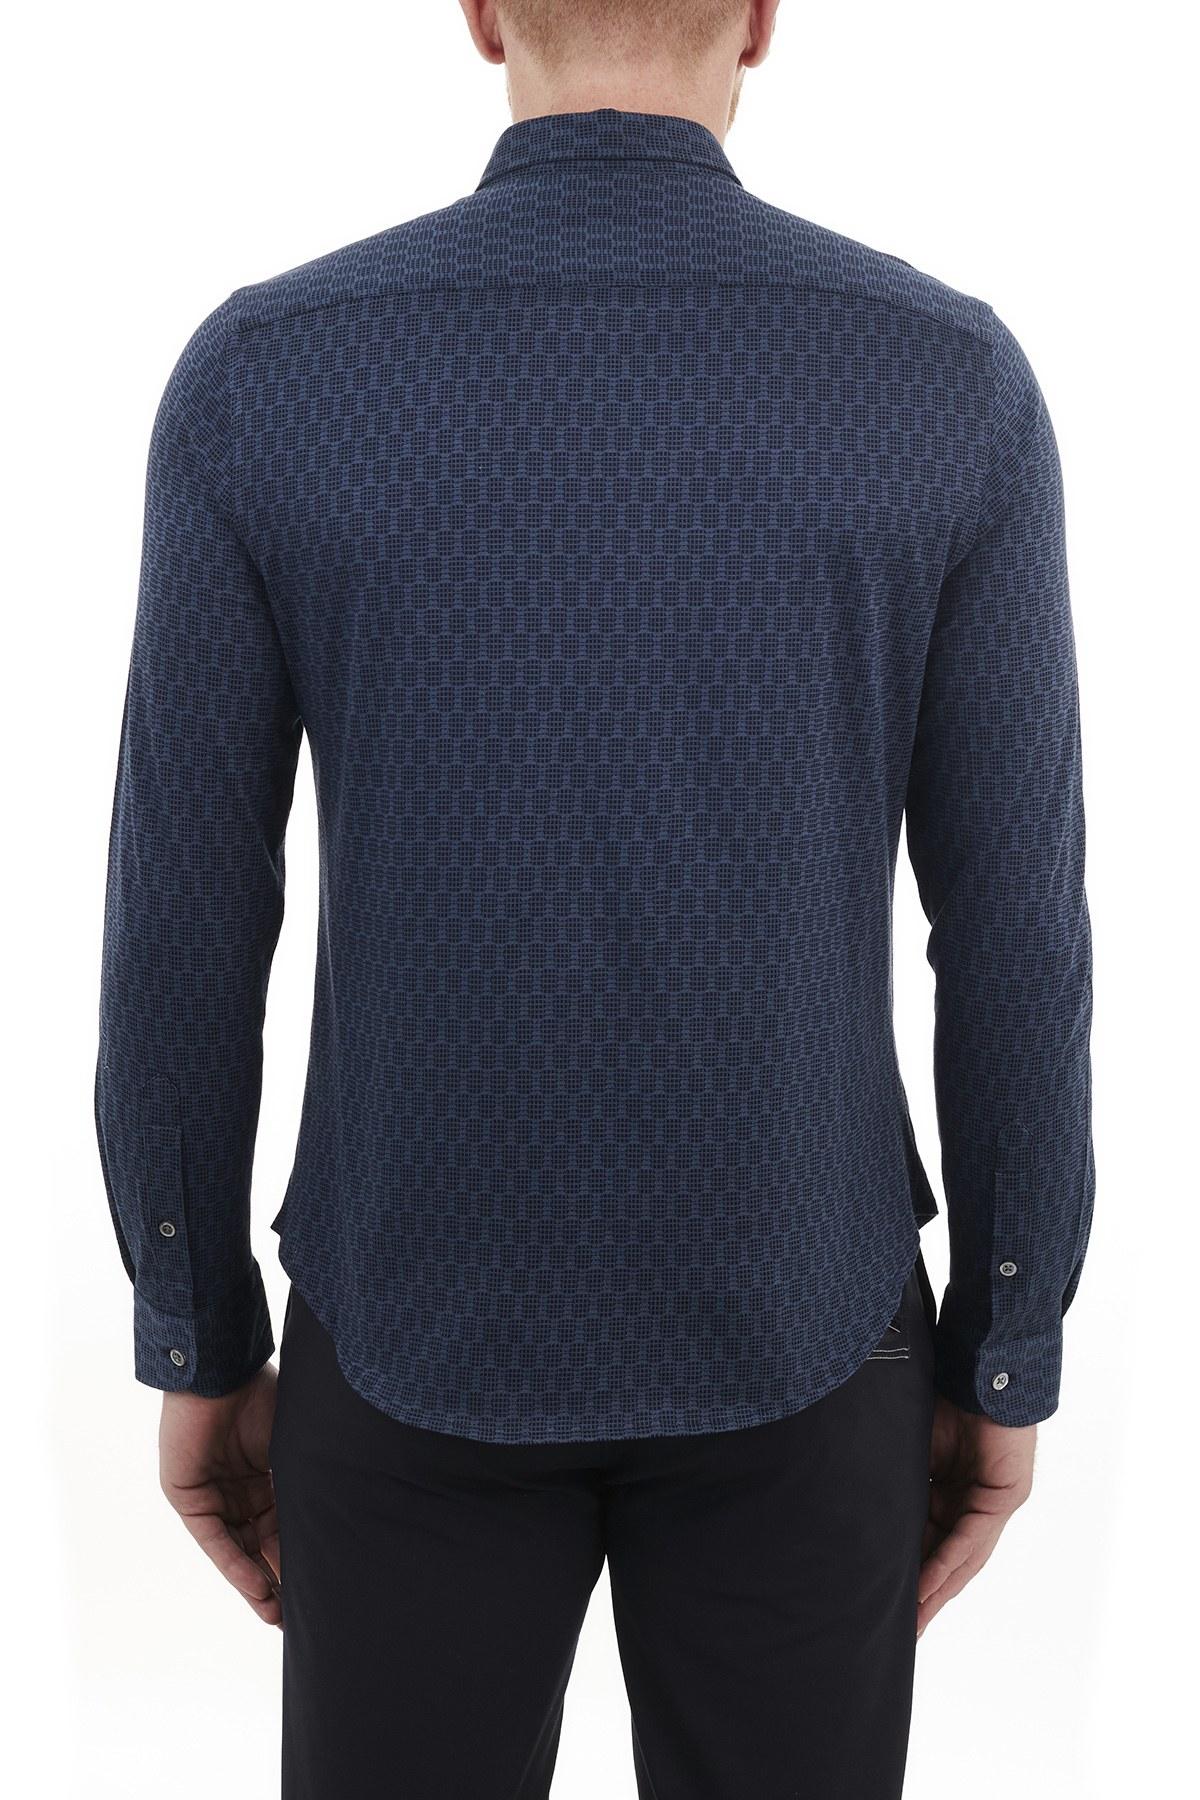 Emporio Armani Düz Yaka % 100 Pamuk Erkek Gömlek 91SM0L 915F1 041 LACİVERT